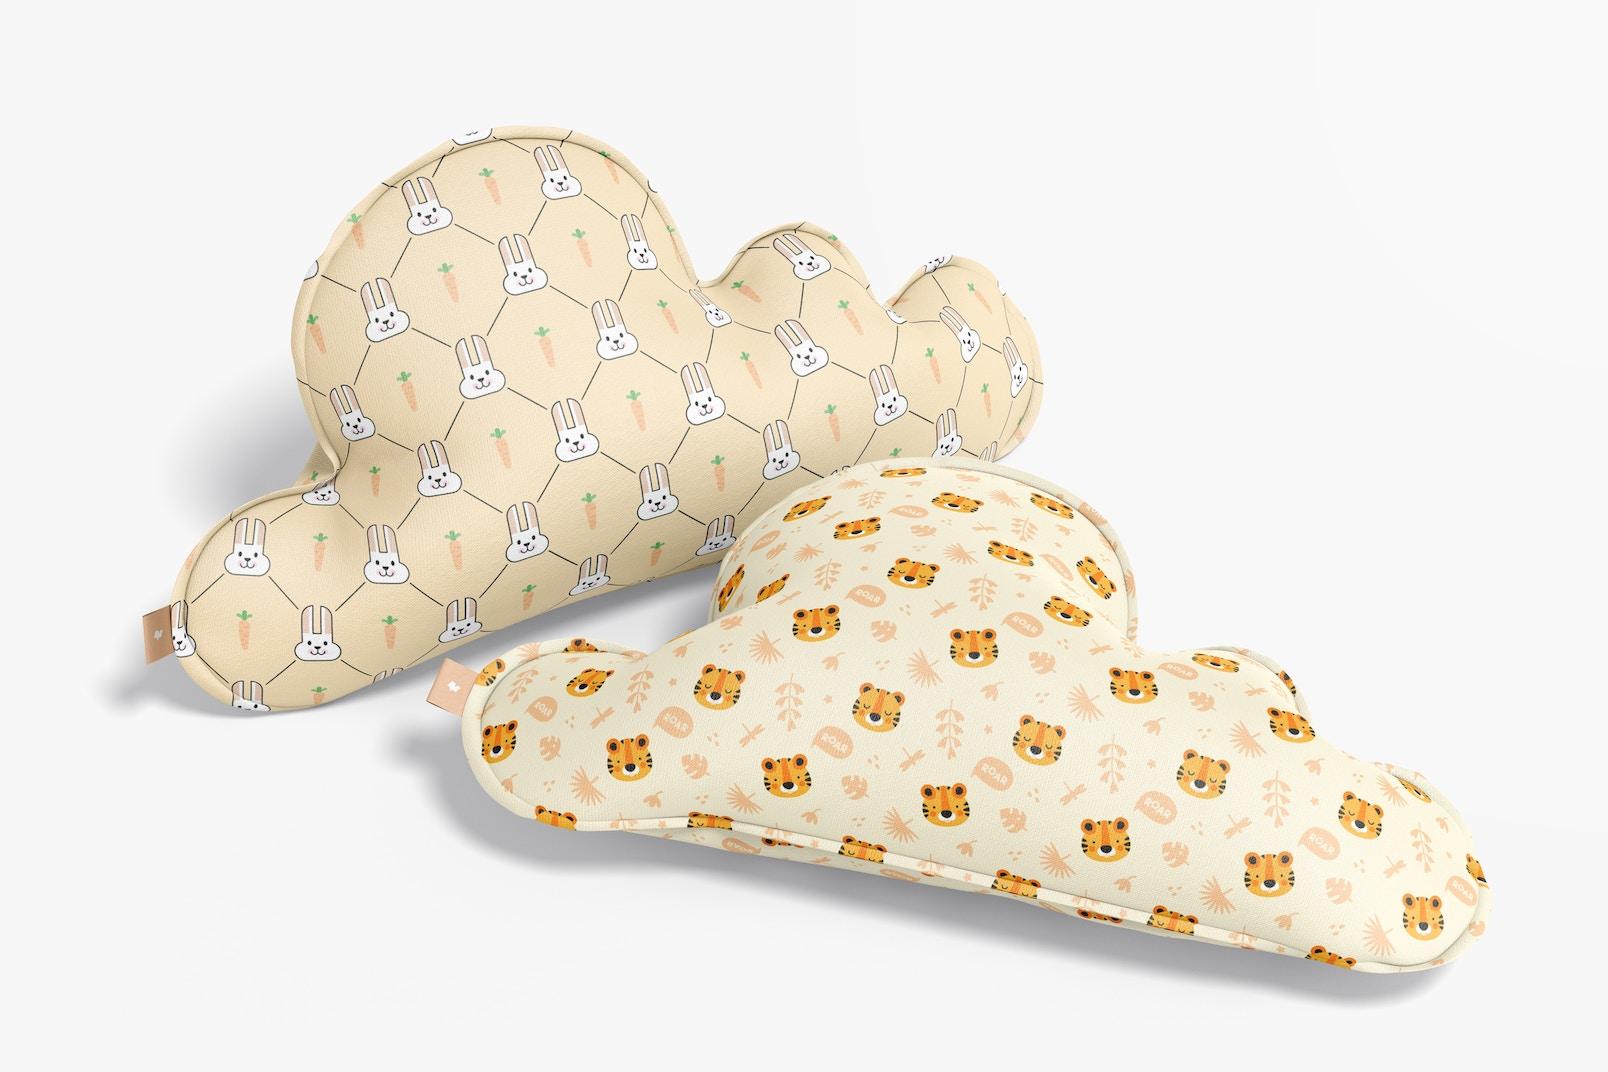 Cloud Pillows Mockup, Perspective